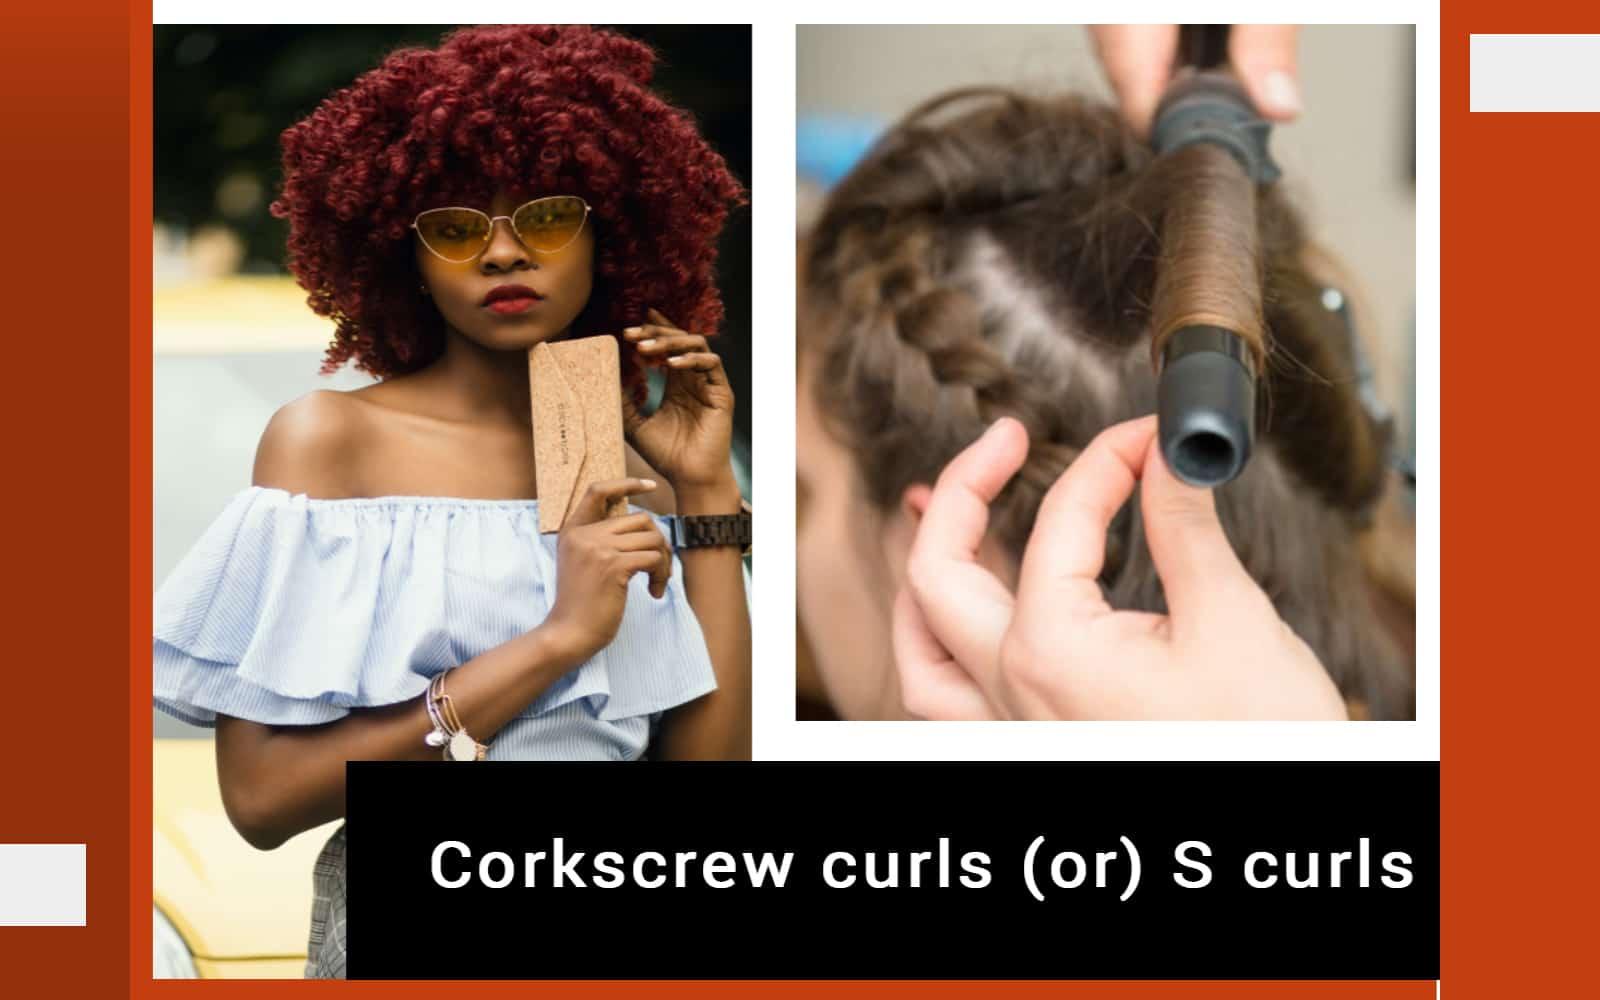 Corkscrew curls (or) S curls